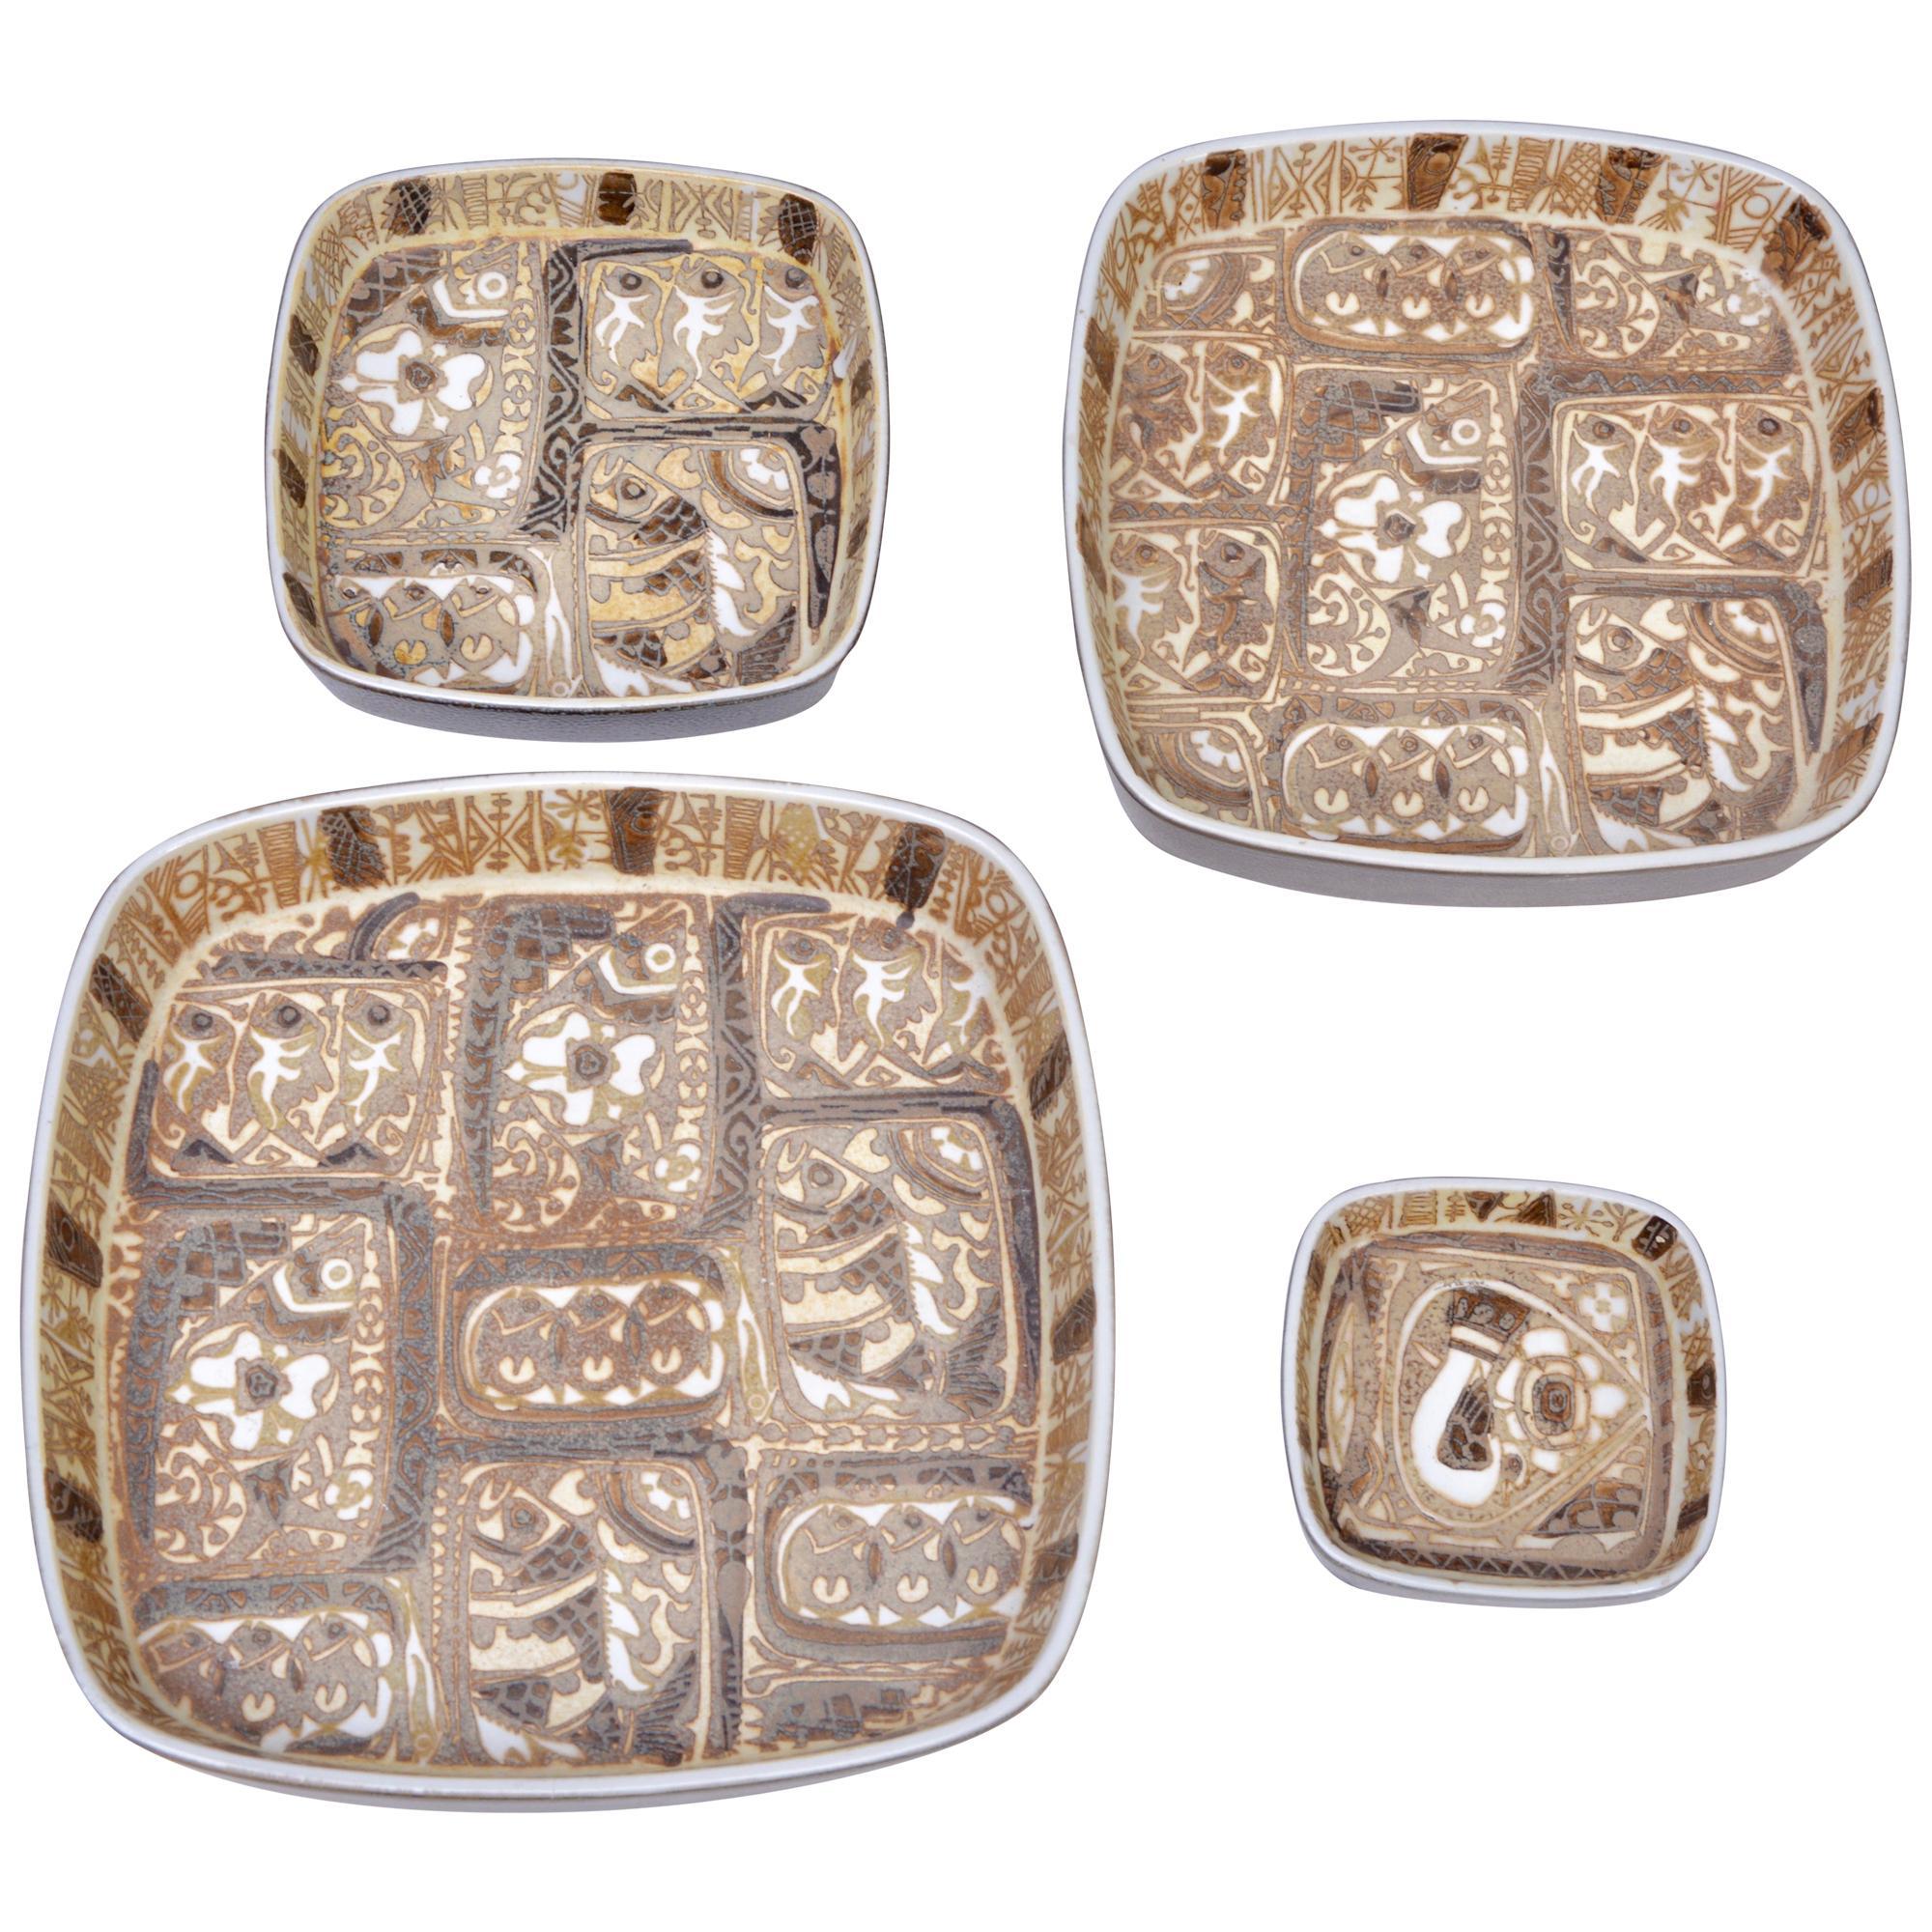 Danish Mid-Century Baca Faience plates set by Nils Thorsson for Royal Copenhagen